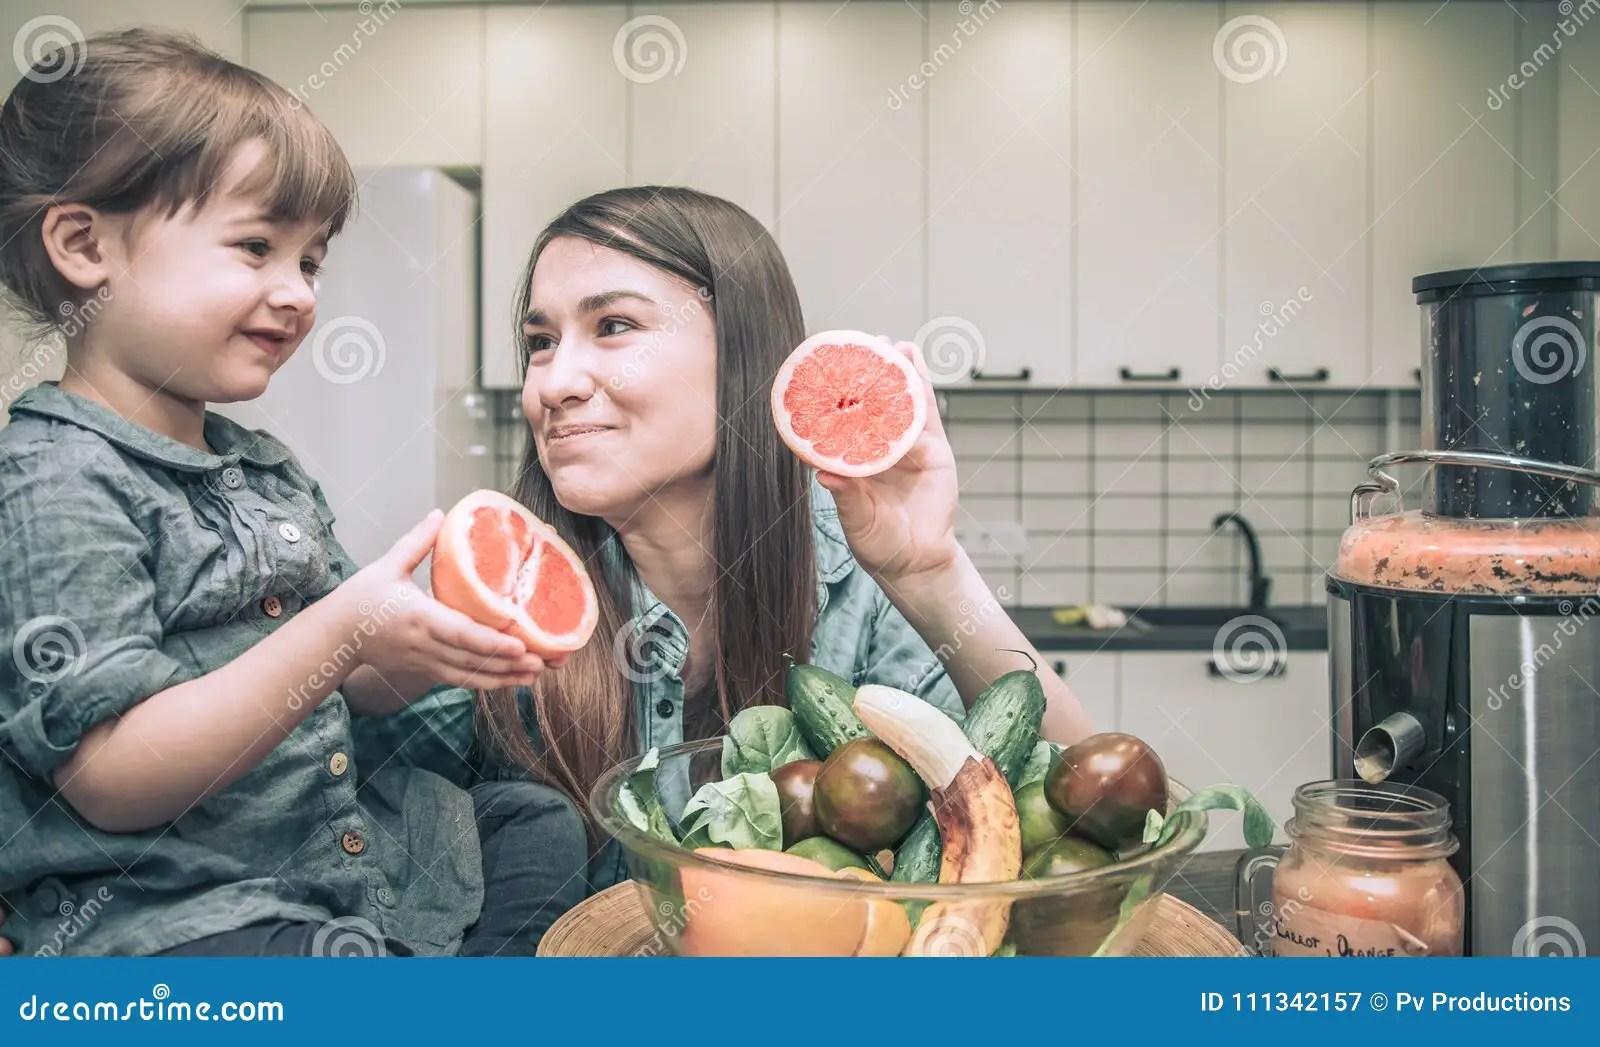 ellas kitchen baby food white eyelet curtains 有孩子的妈妈在厨房准备新鲜的汁液库存图片 图片包括有烹调 果子 女孩 有两个可爱的女儿的母亲在厨房里准备新鲜水果汁 健康婴儿食品的概念和一个愉快的家庭